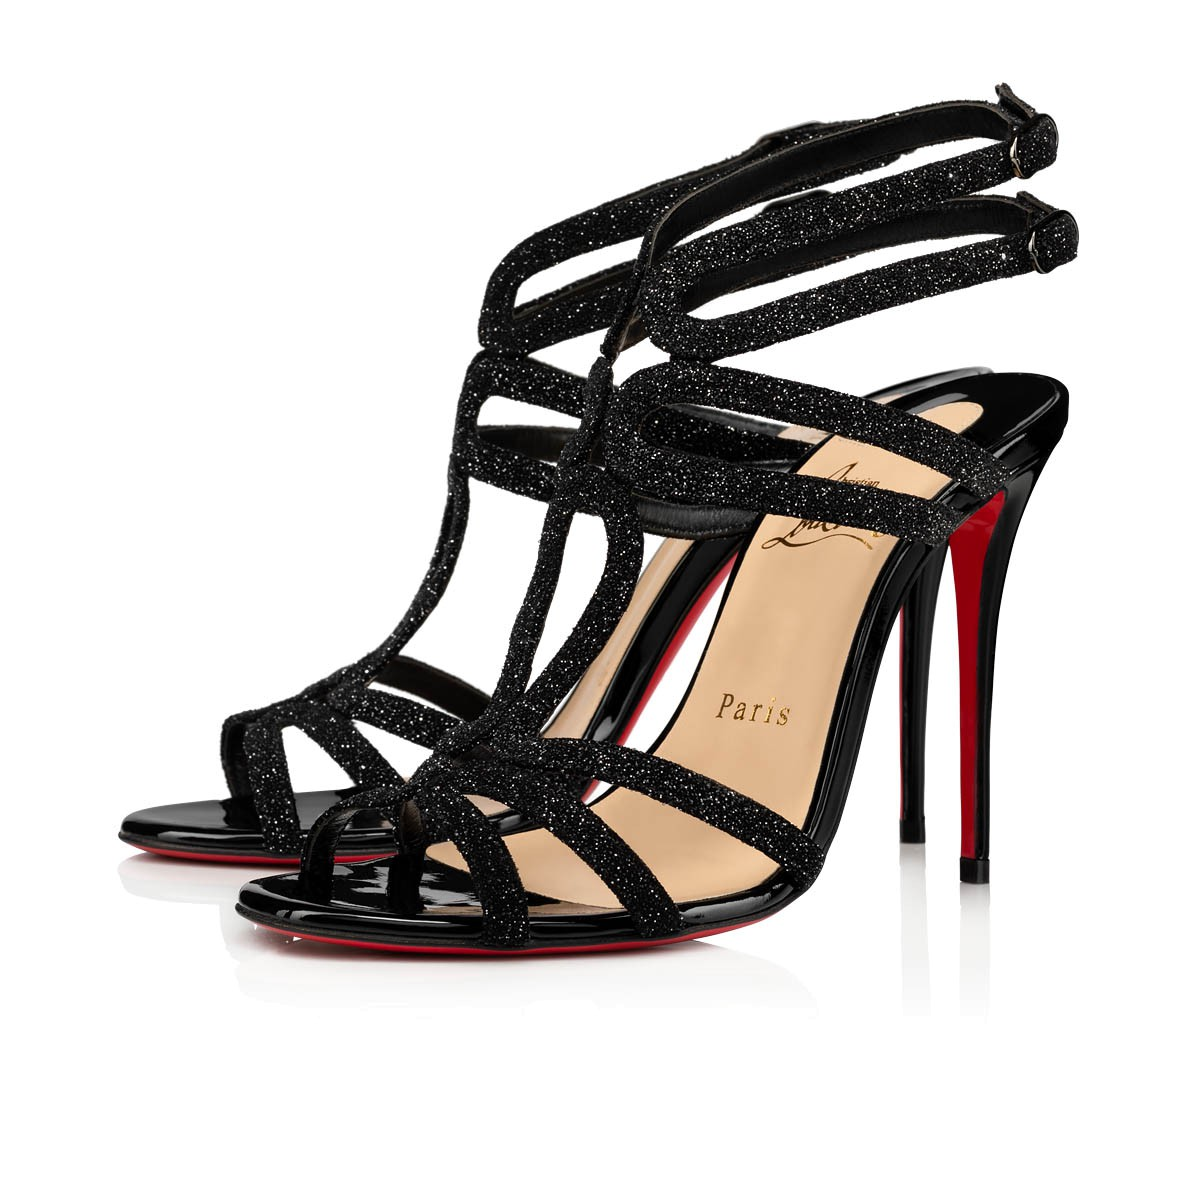 Shoes - Renee - Christian Louboutin